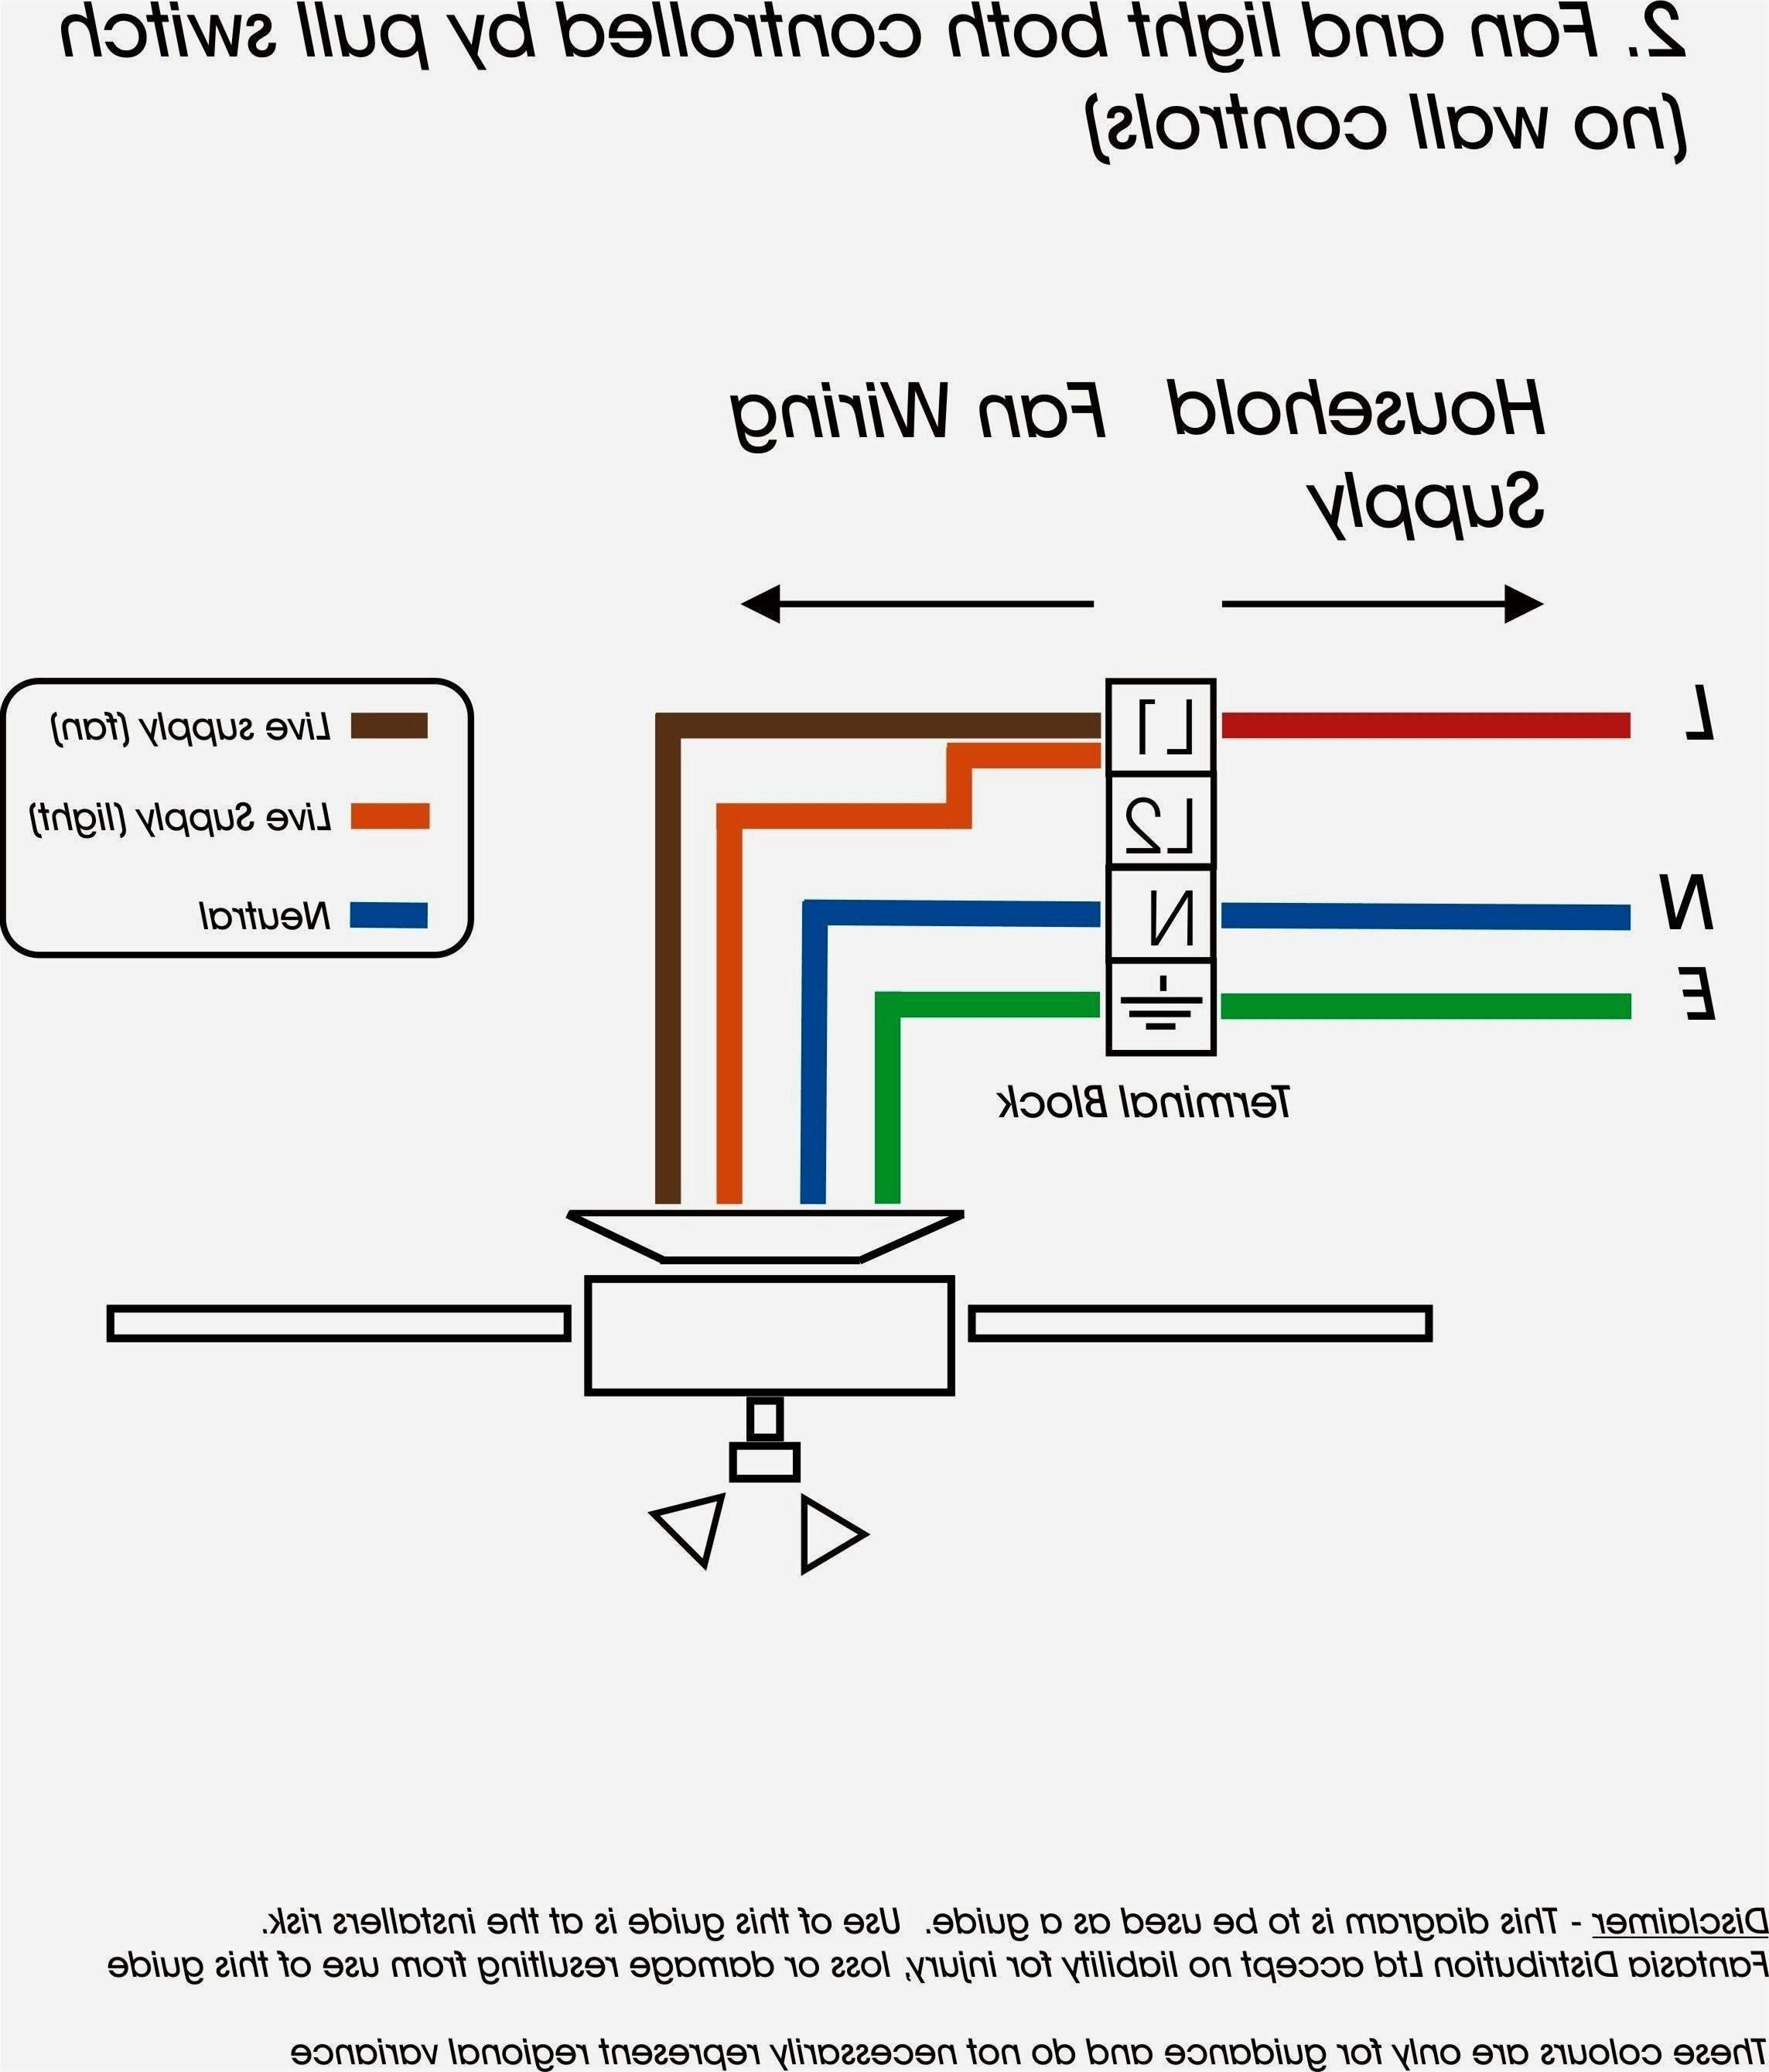 lutron maestro 3 way dimmer wiring diagram - wiring diagram for quadzilla  adrenaline valid wiring diagram